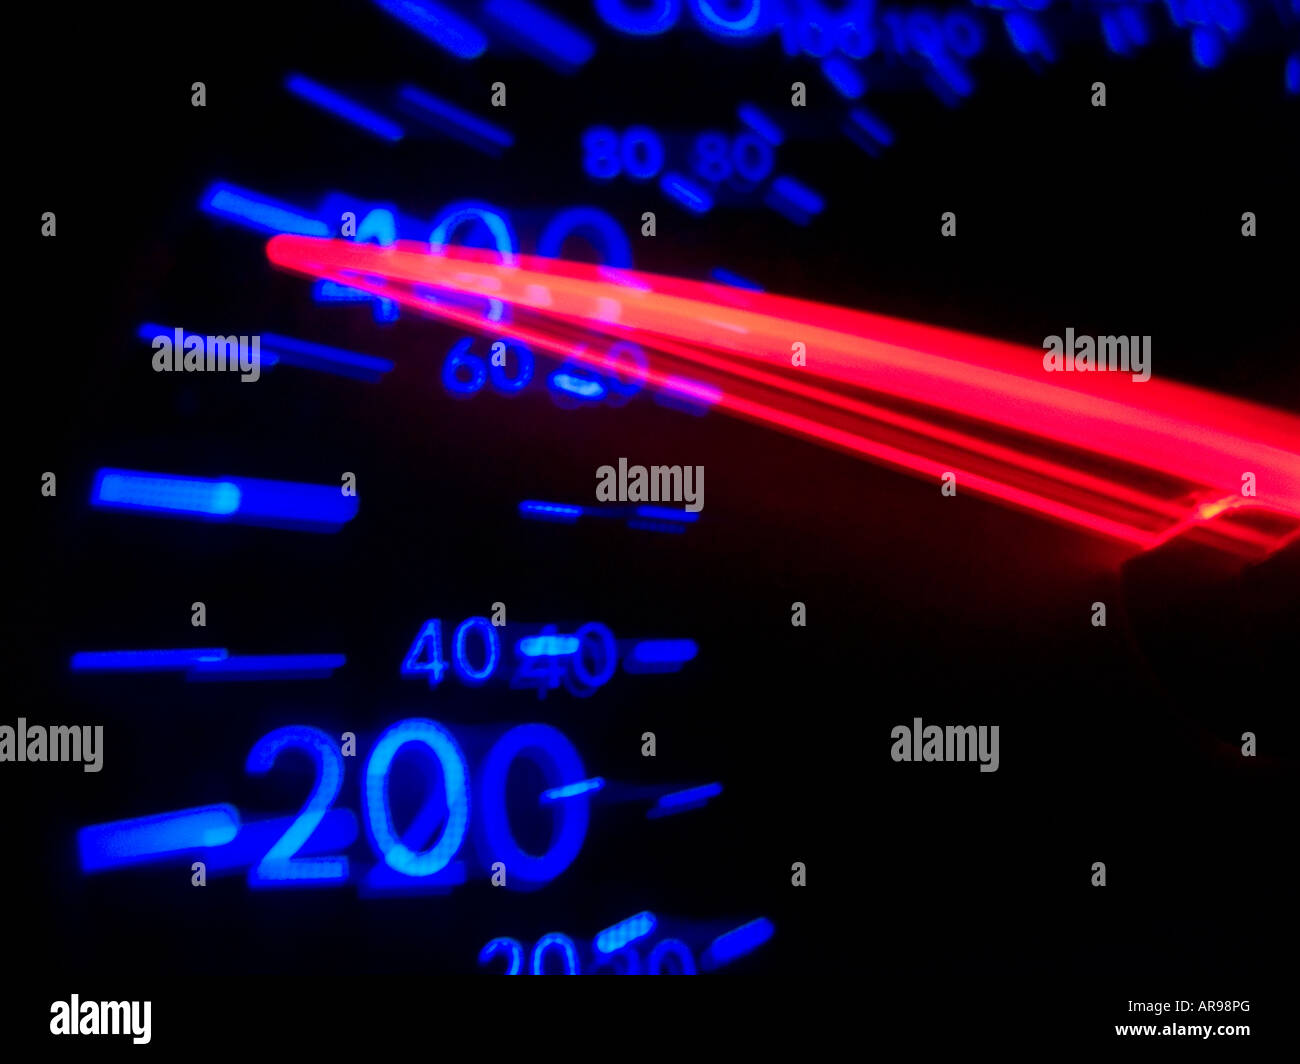 Blurry speedometer odometer car dashboard illuminated at night - Stock Image